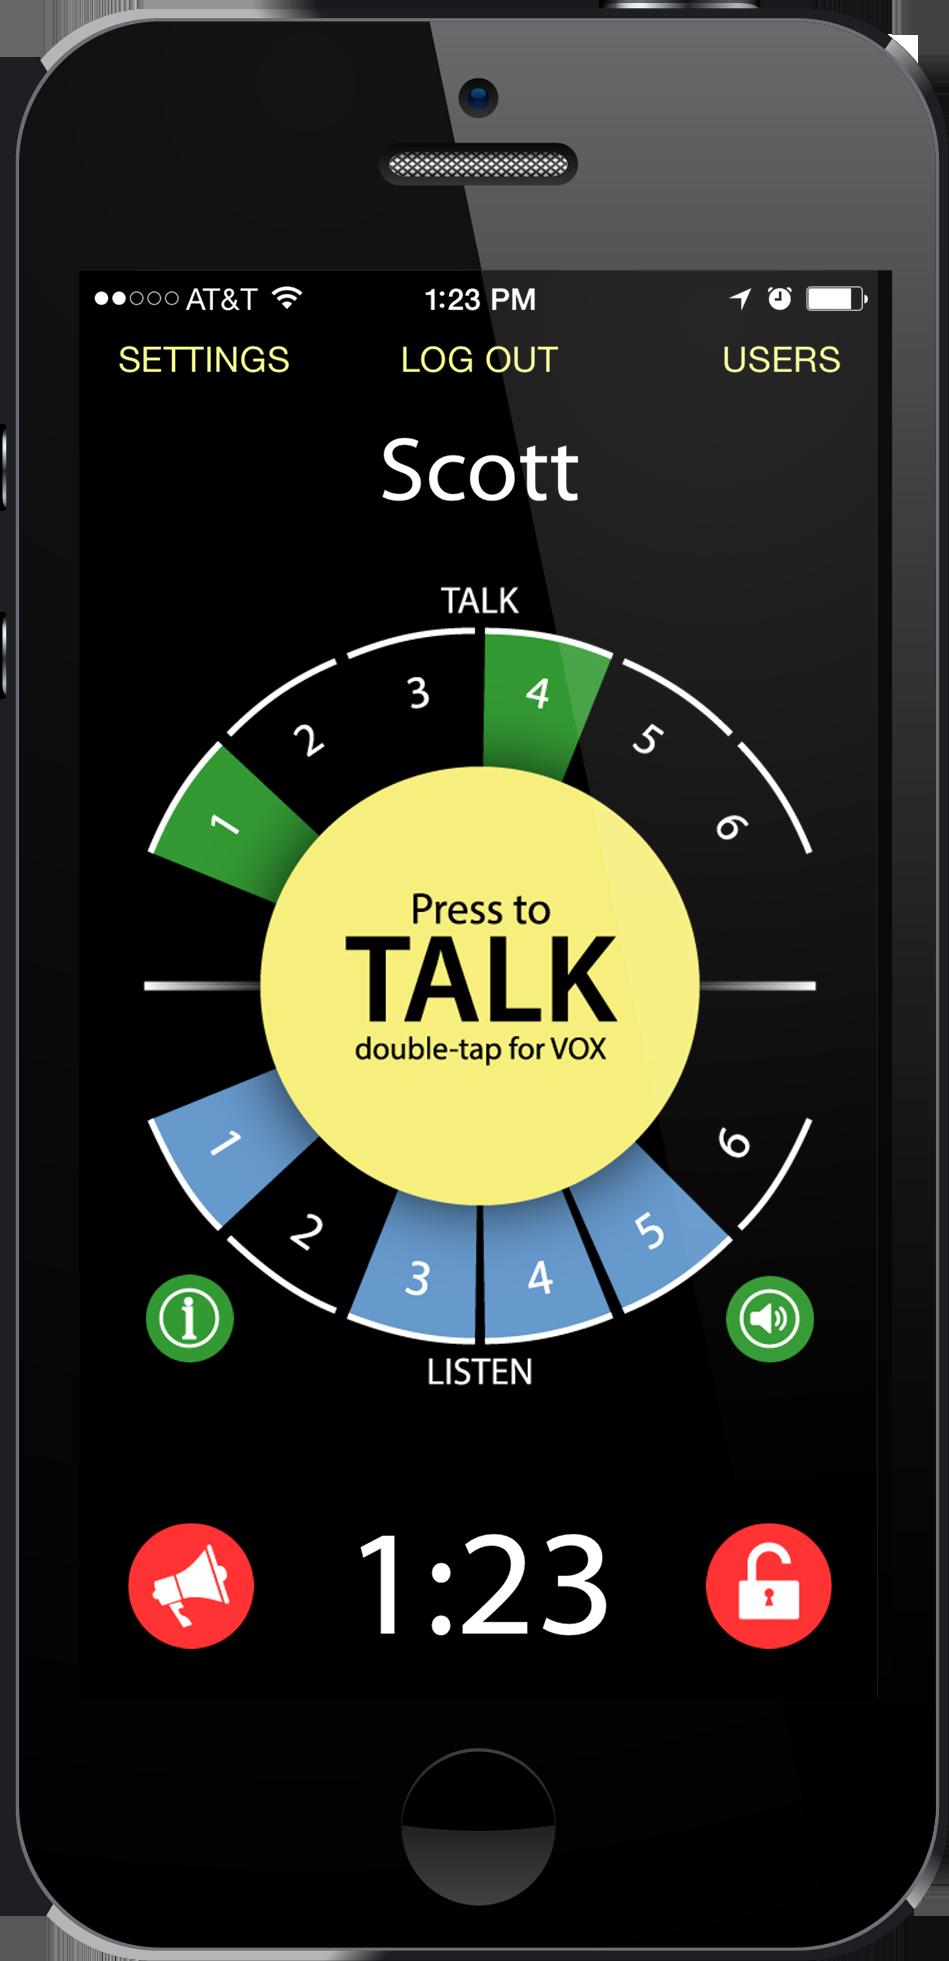 Unity Intercom on iOS